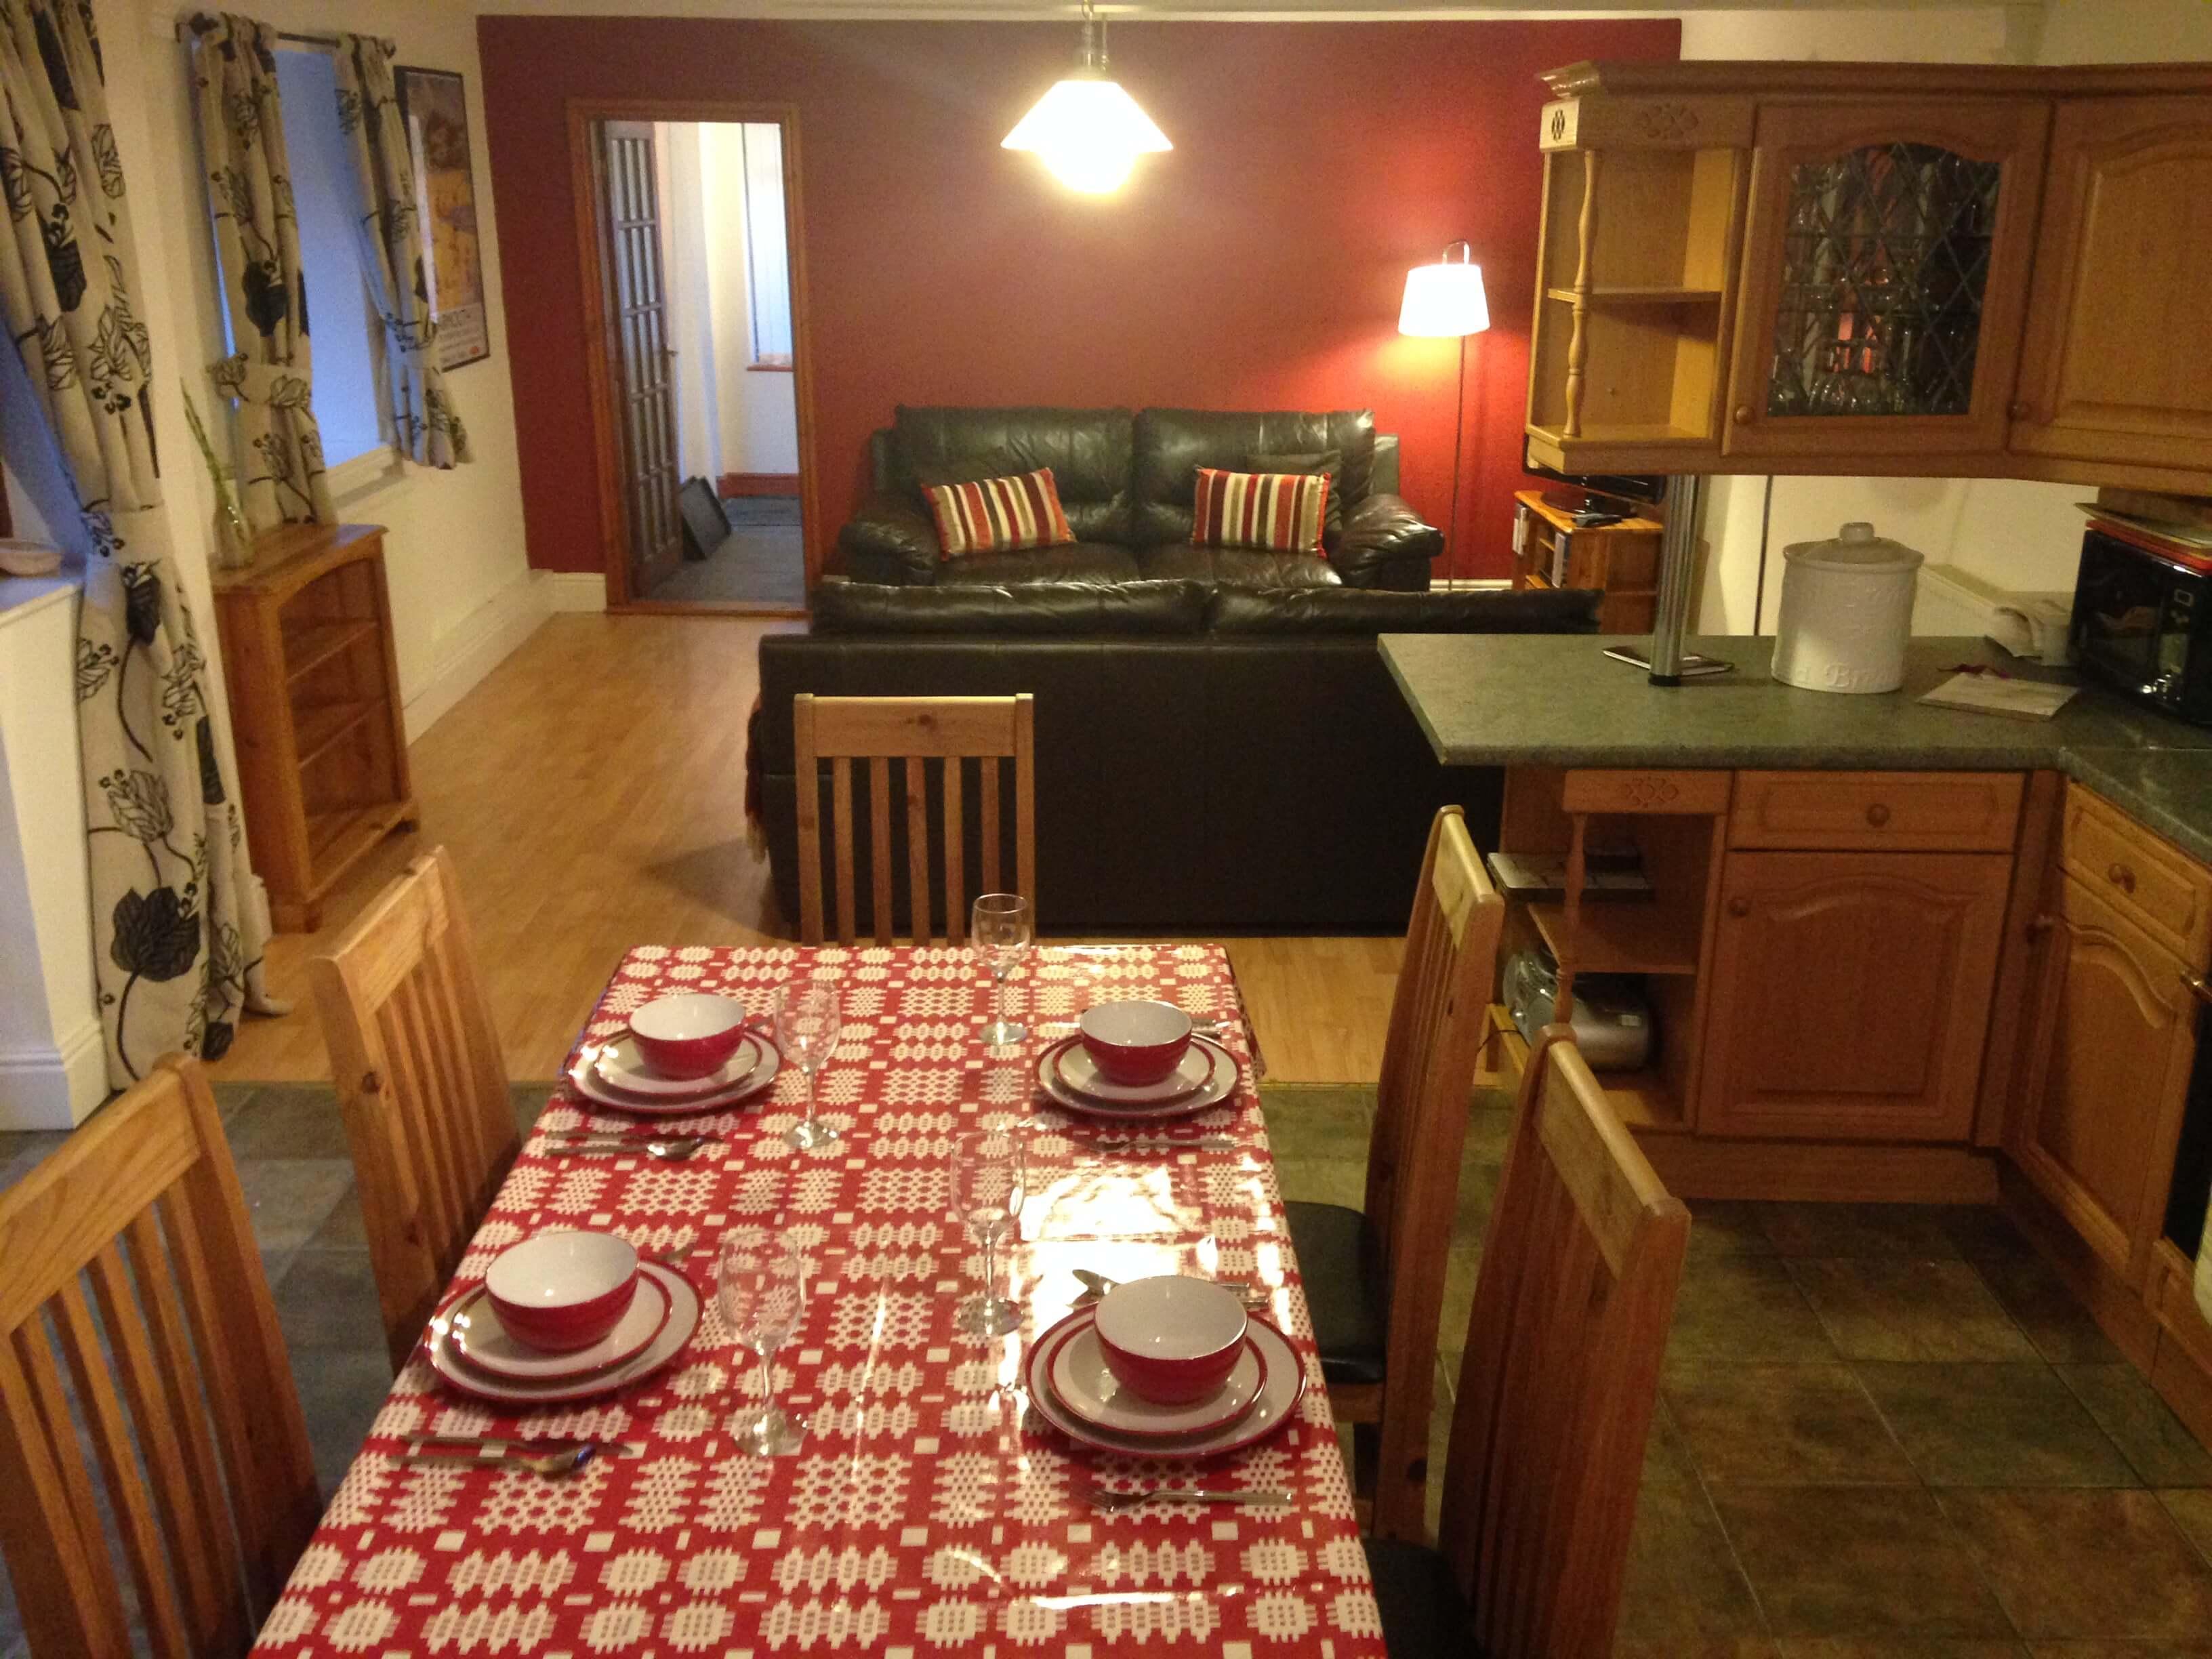 Big kitchen table